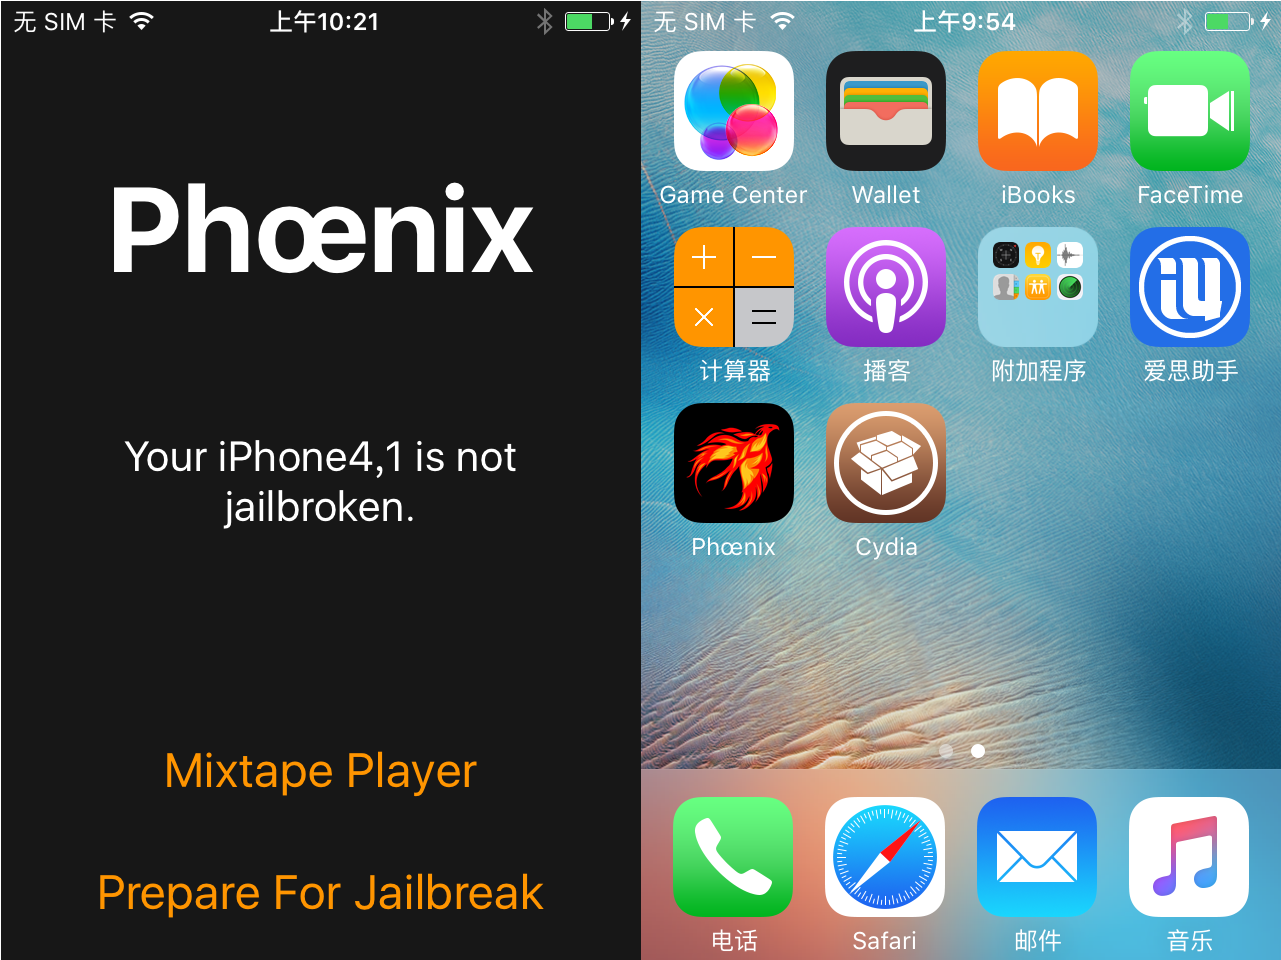 iOS 9.3.5可以越狱了吗?iOS 9.3.5如何越狱